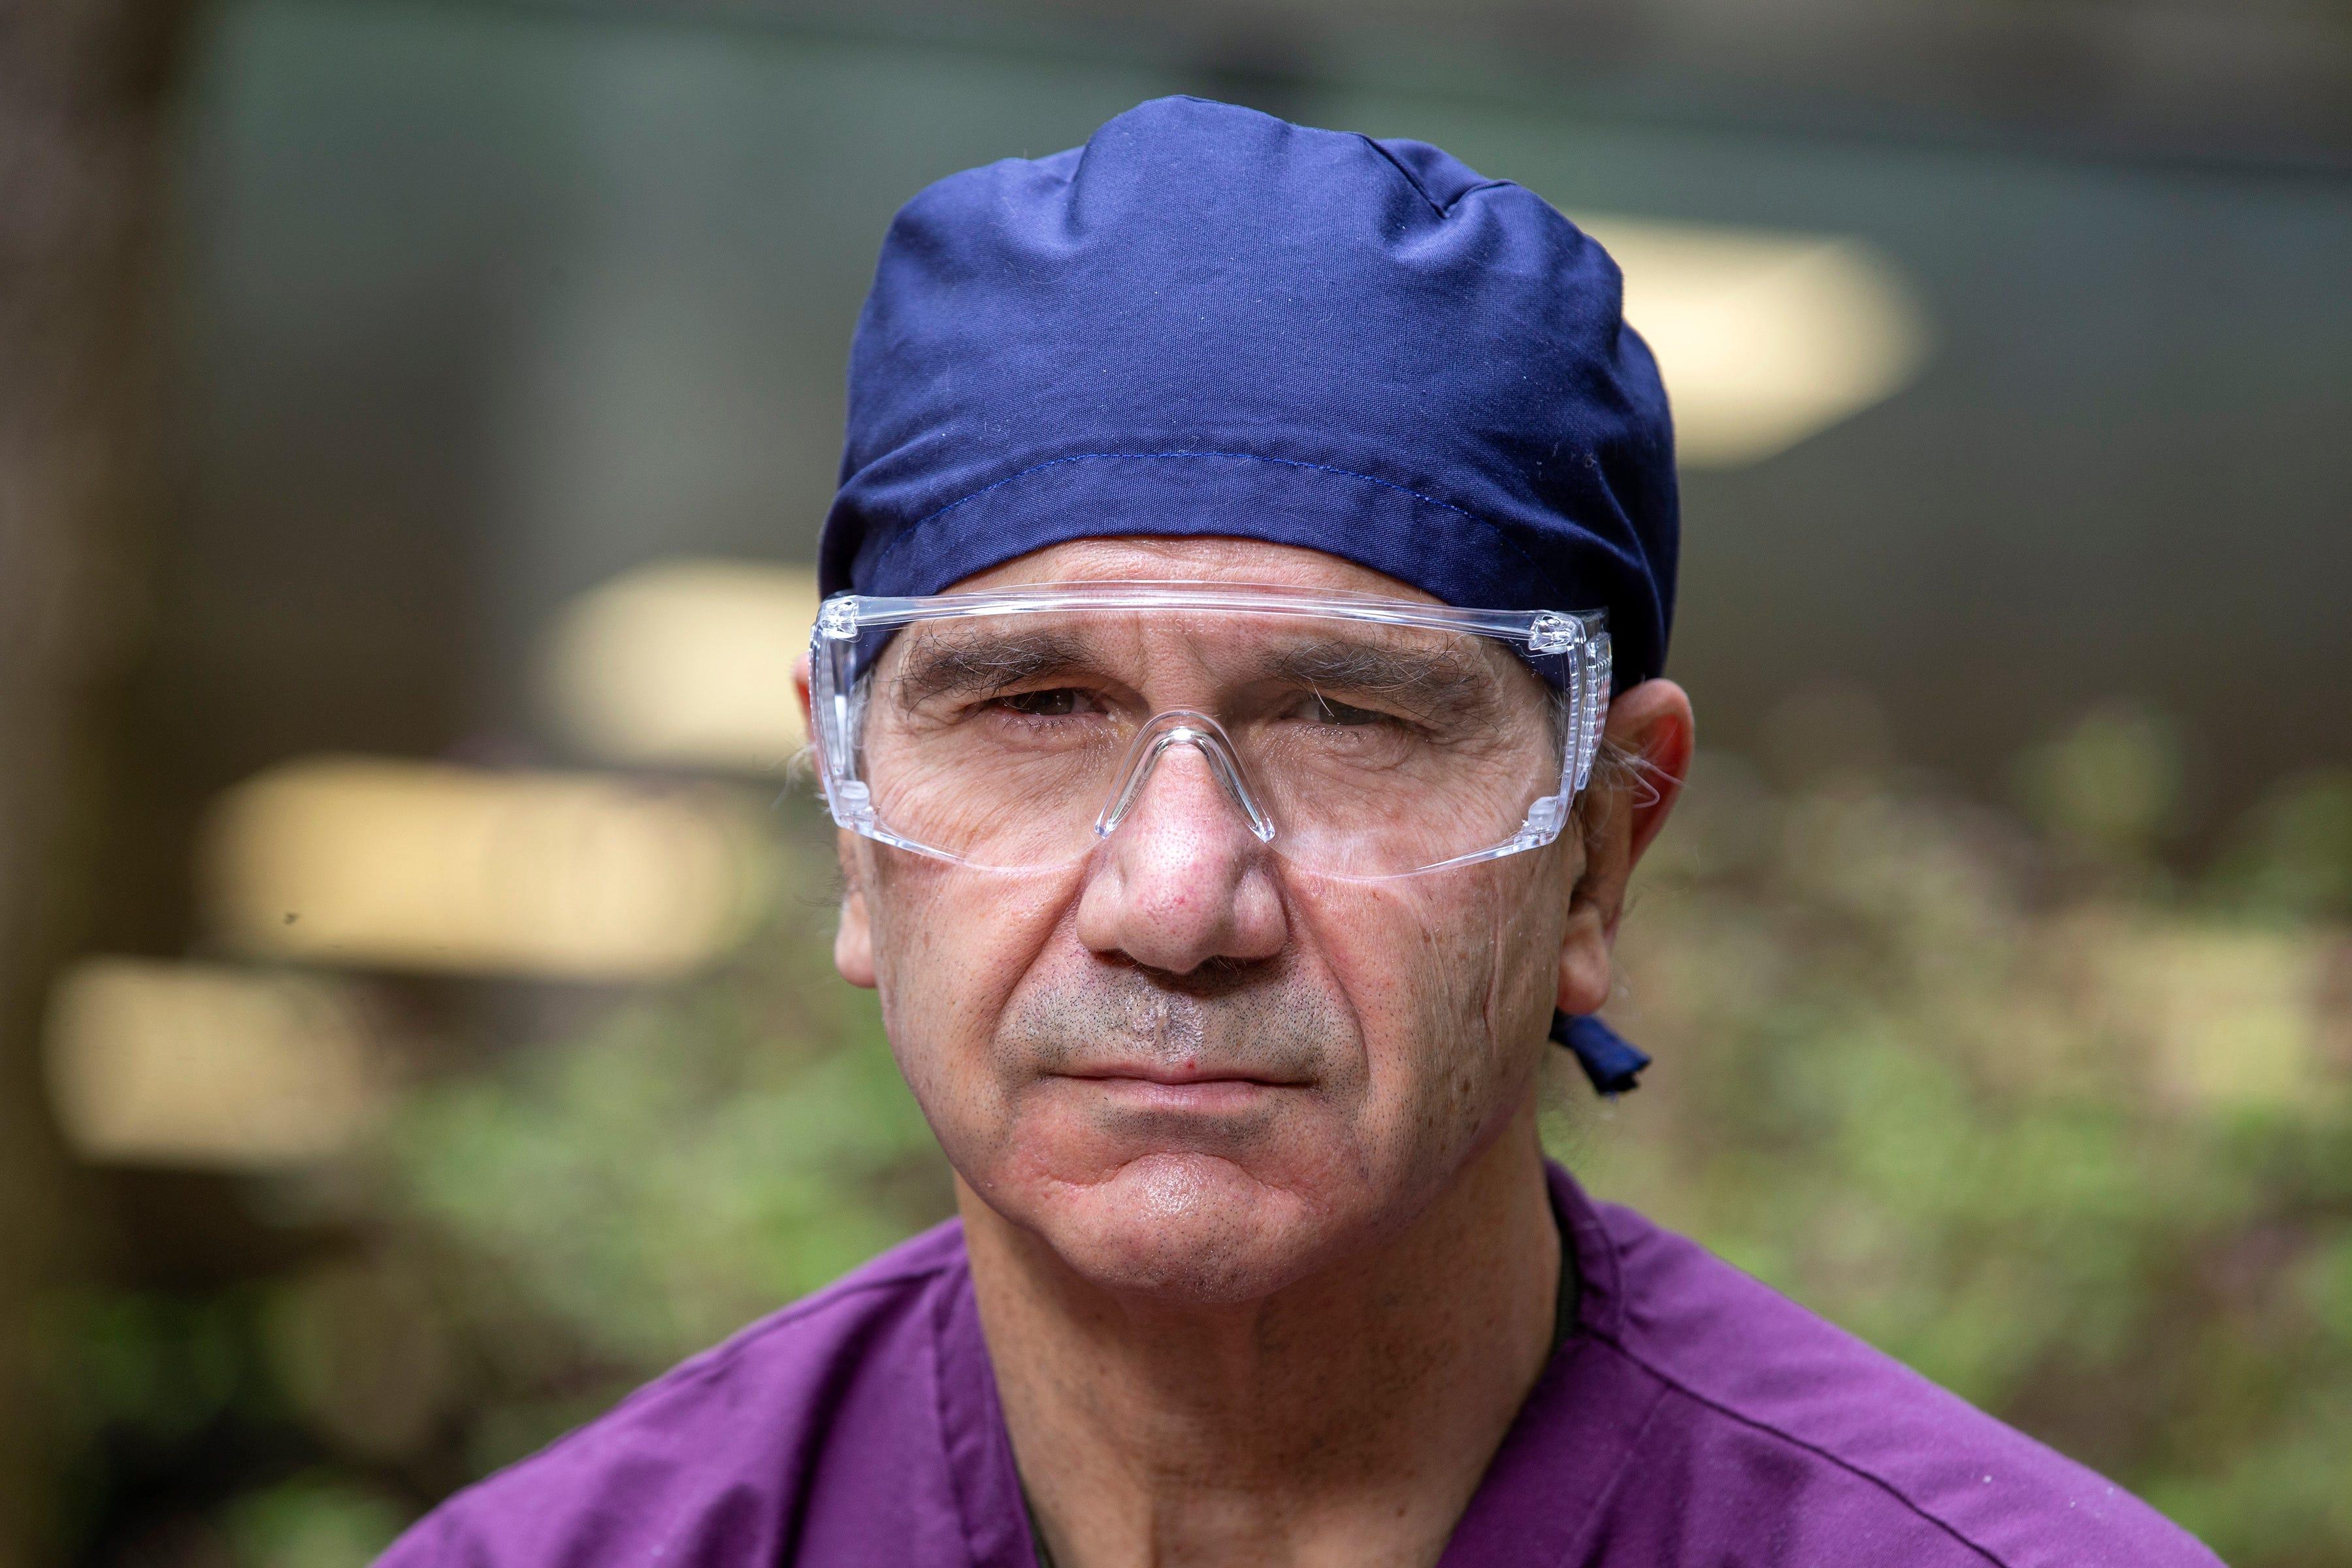 Dr. Jose Iglesias